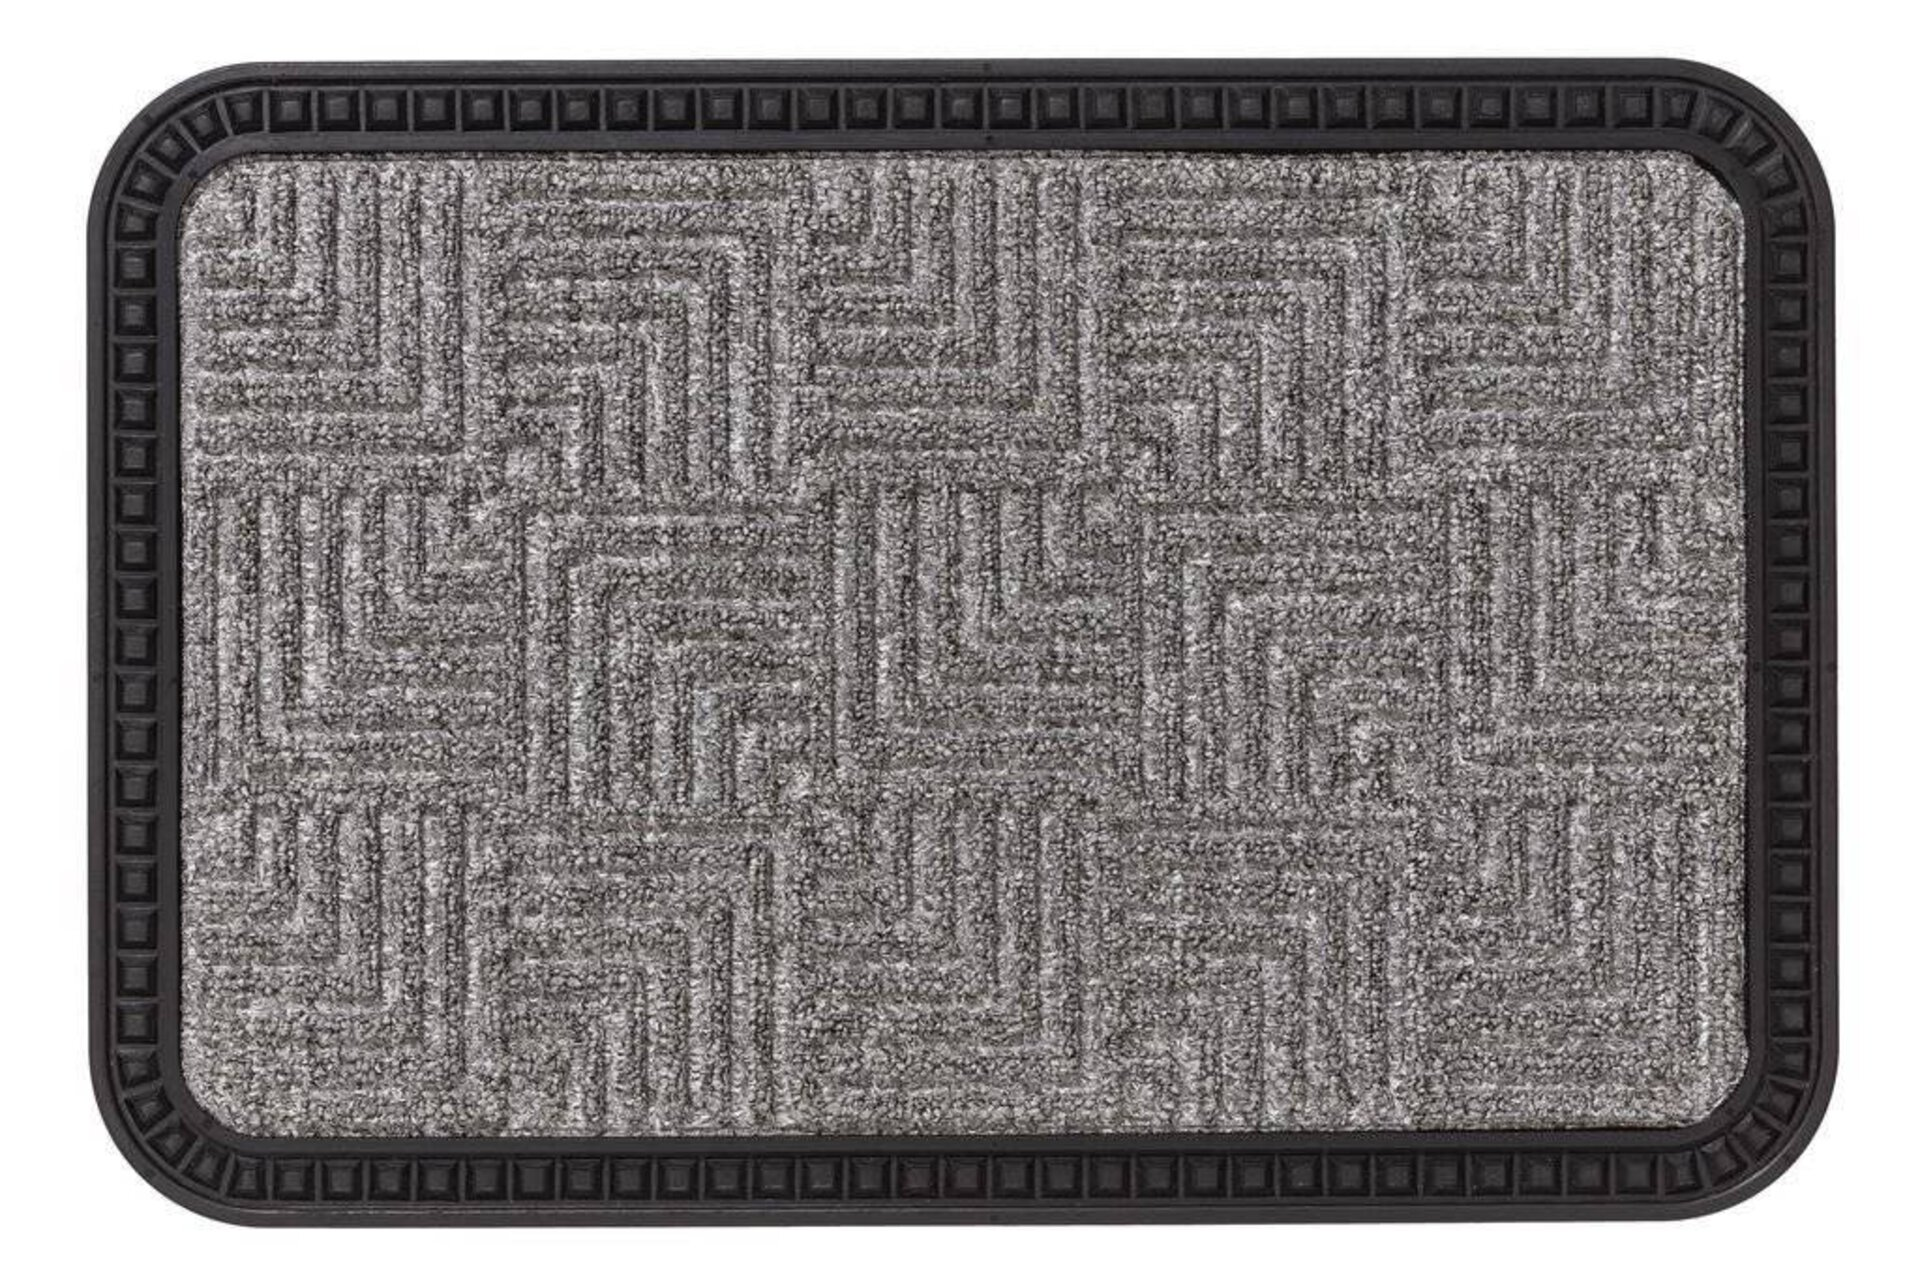 Türmatte Border Star Astra Textil 50 x 80 cm